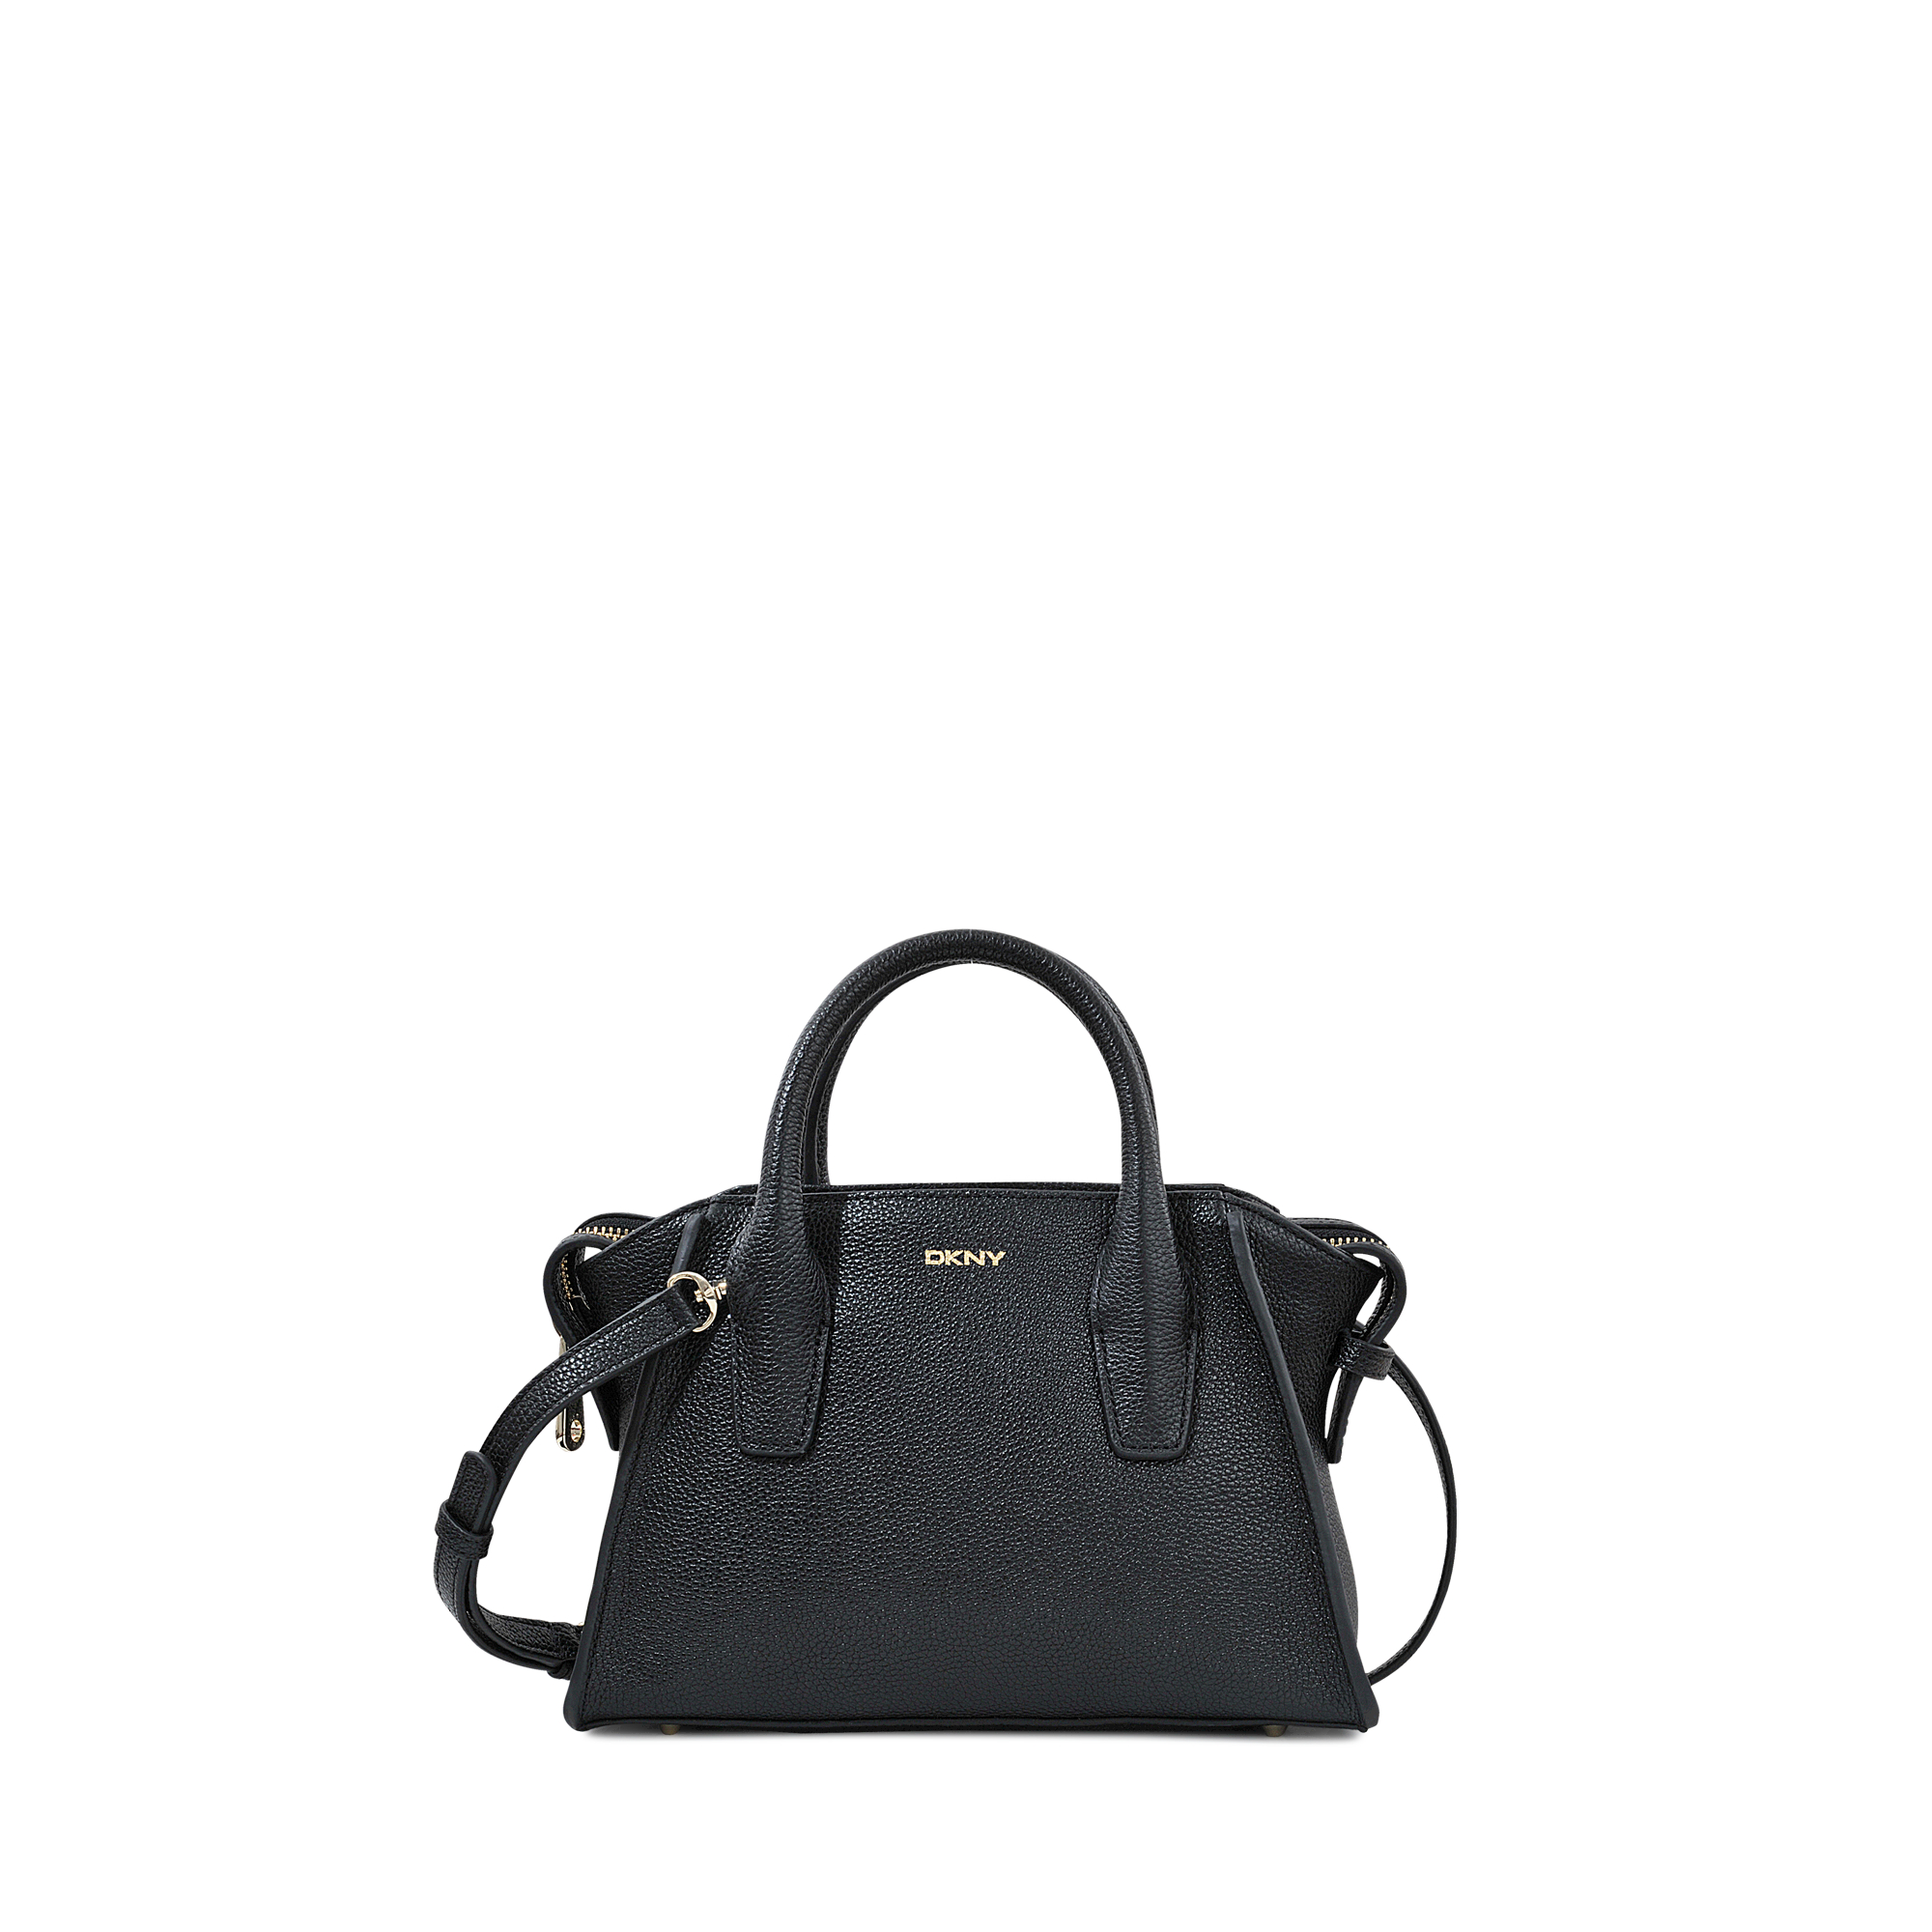 Dkny Mini Satchel Chelsea Bag in Black | Lyst